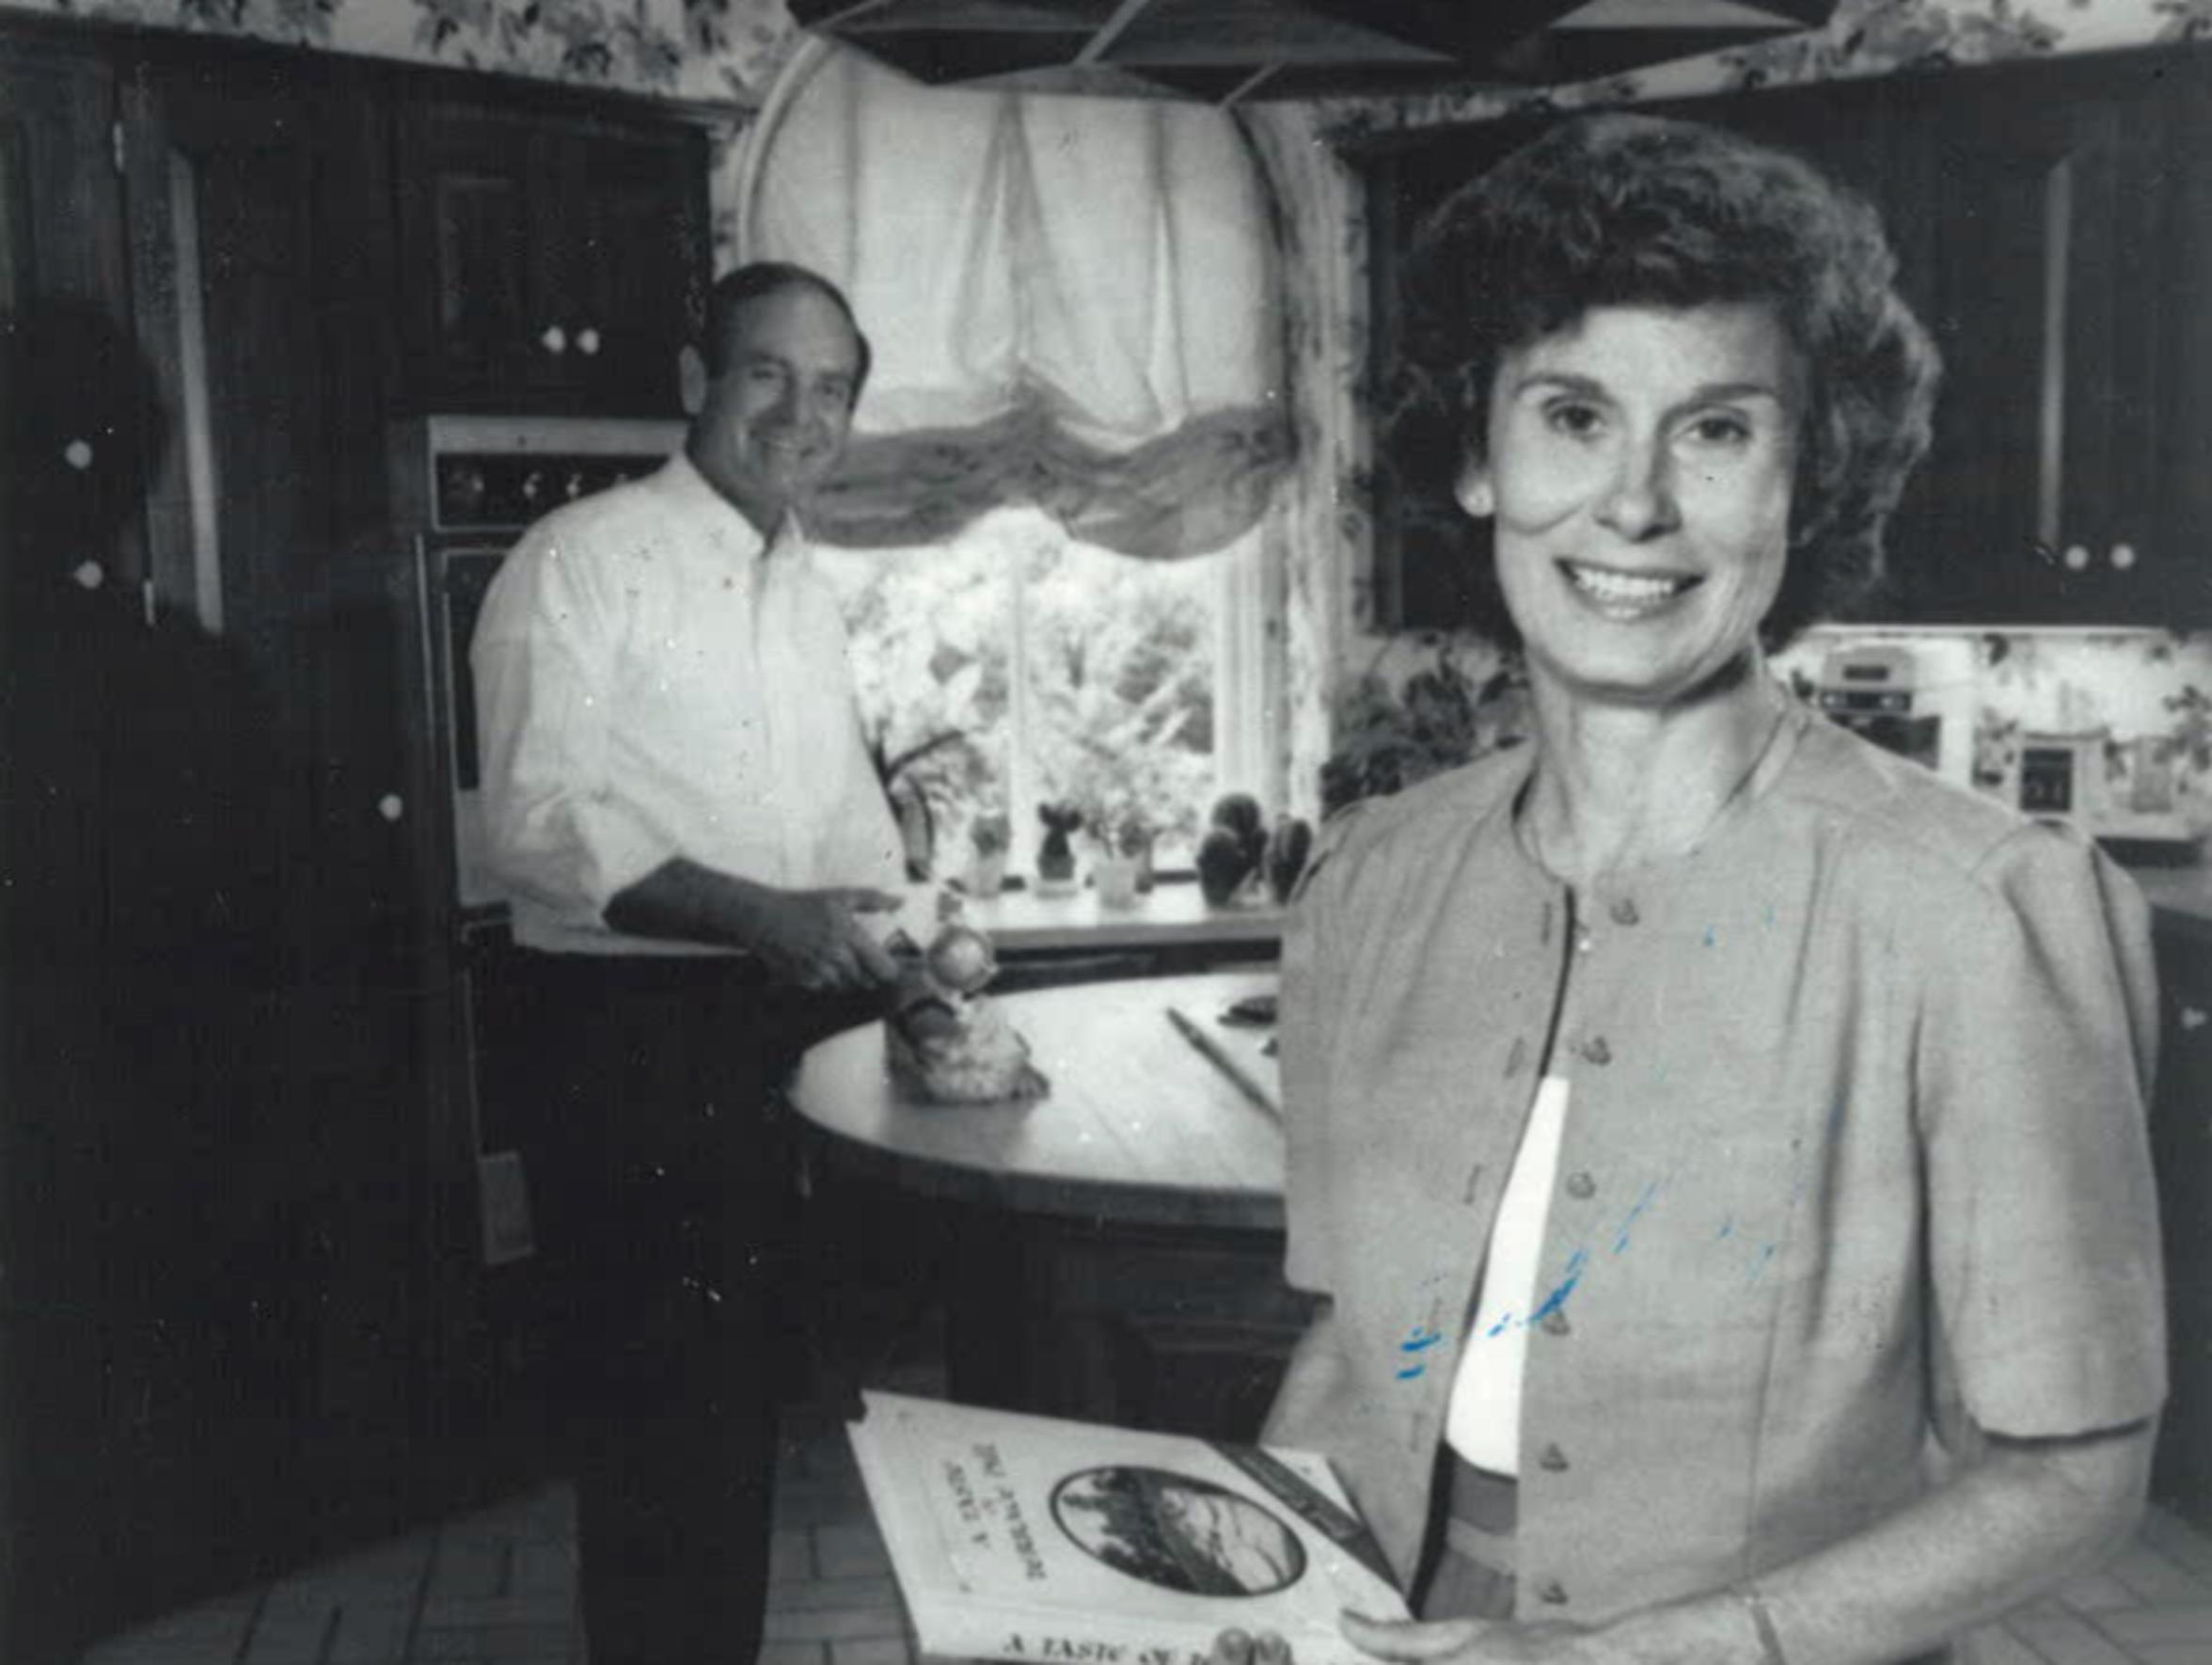 From 1982: Billie Ray and her husband, Iowa Gov. Robert